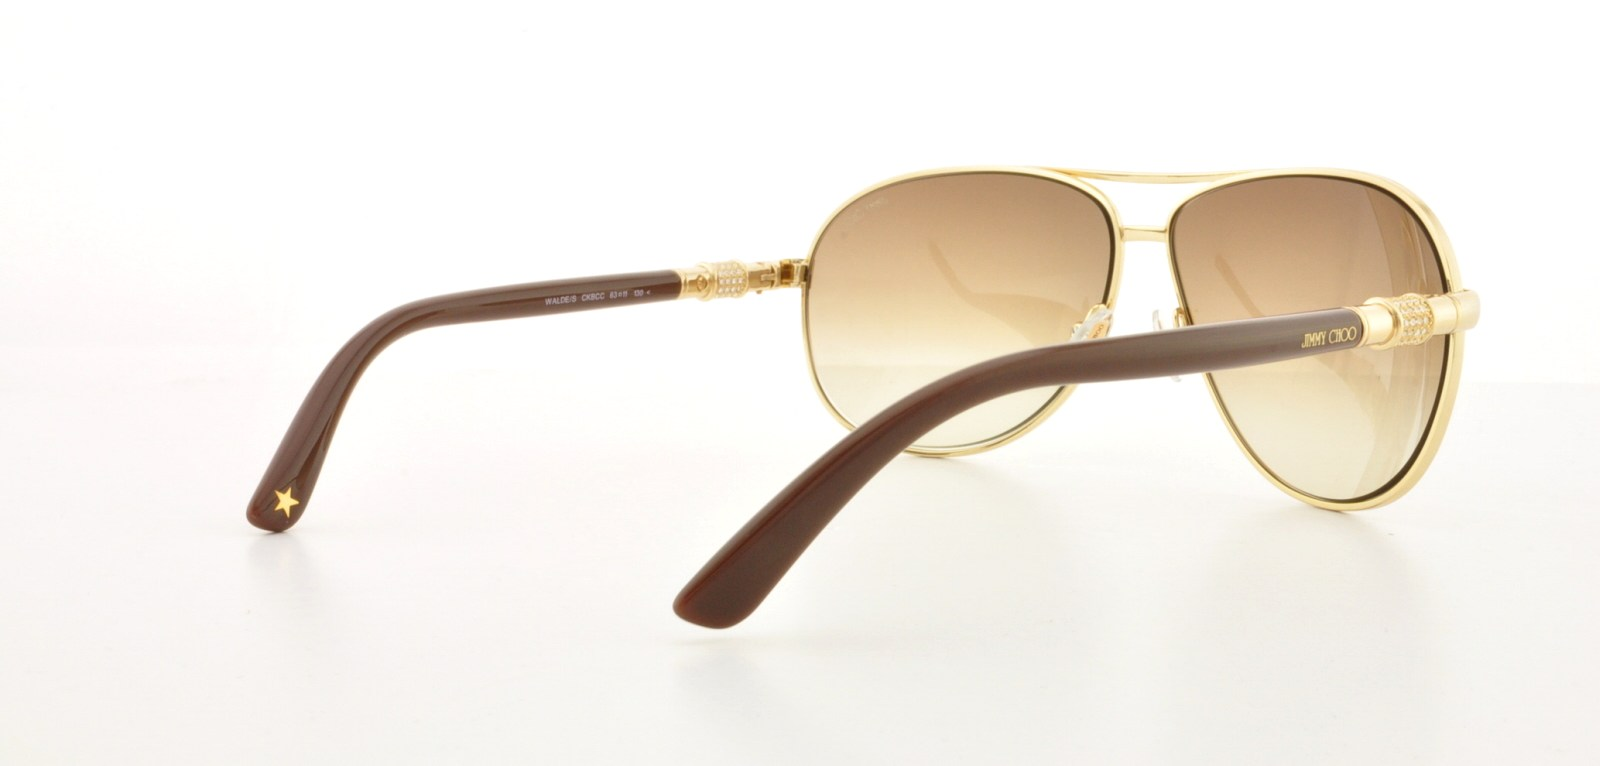 be53839064 Jimmy Choo Sunglasses - Walde S   Frame  Rose Gold Lens  Brown gradient -  Walmart.com